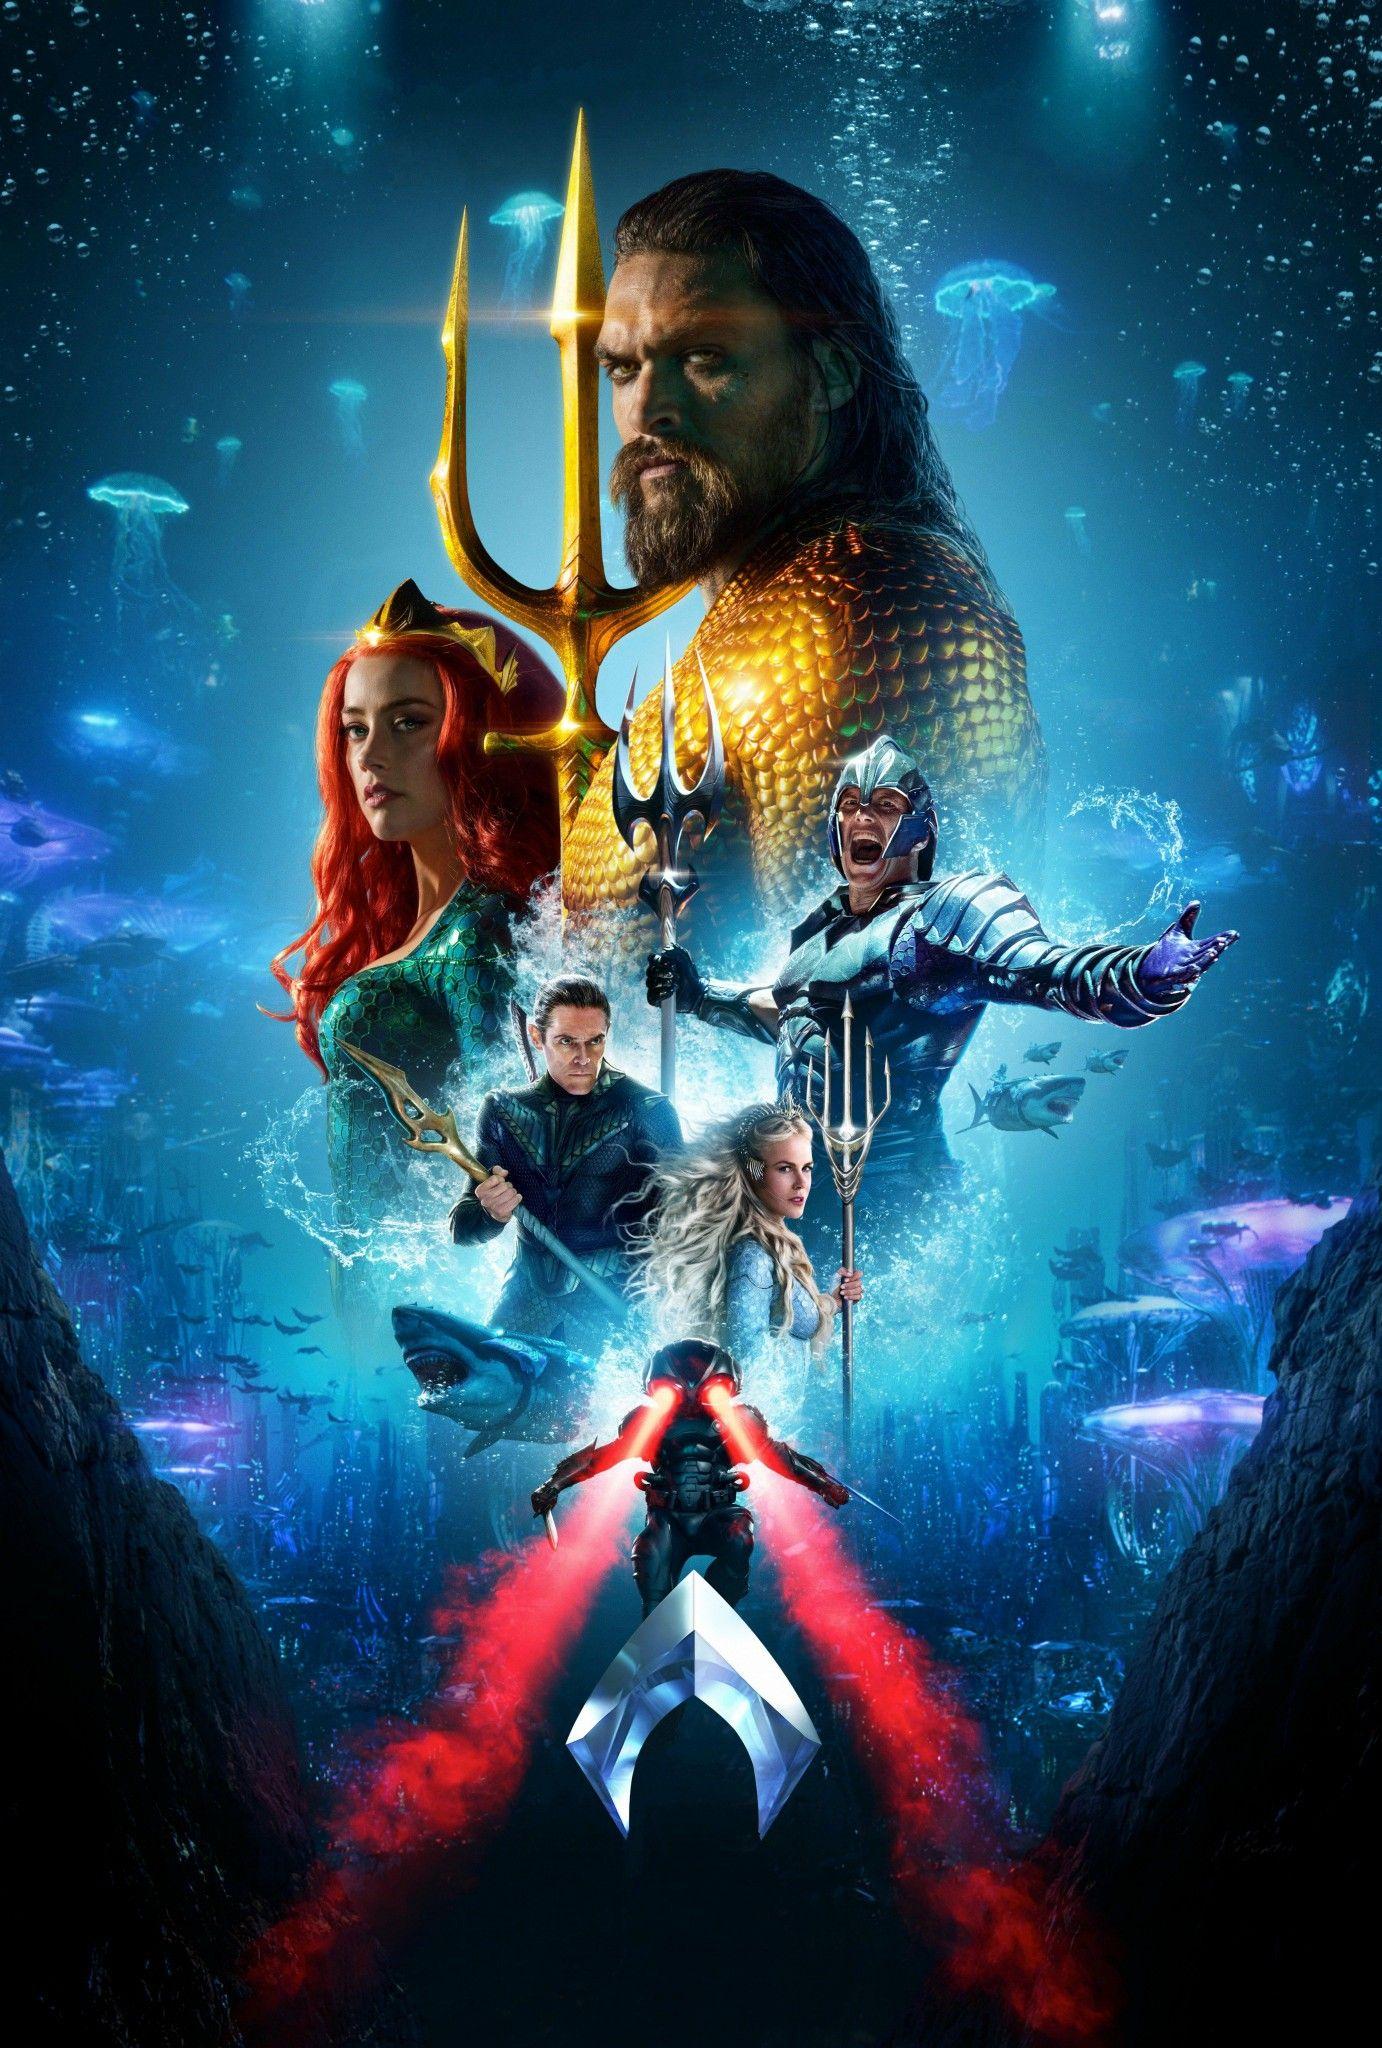 Pin By Sian Hoy On Aquaman Aquaman Film